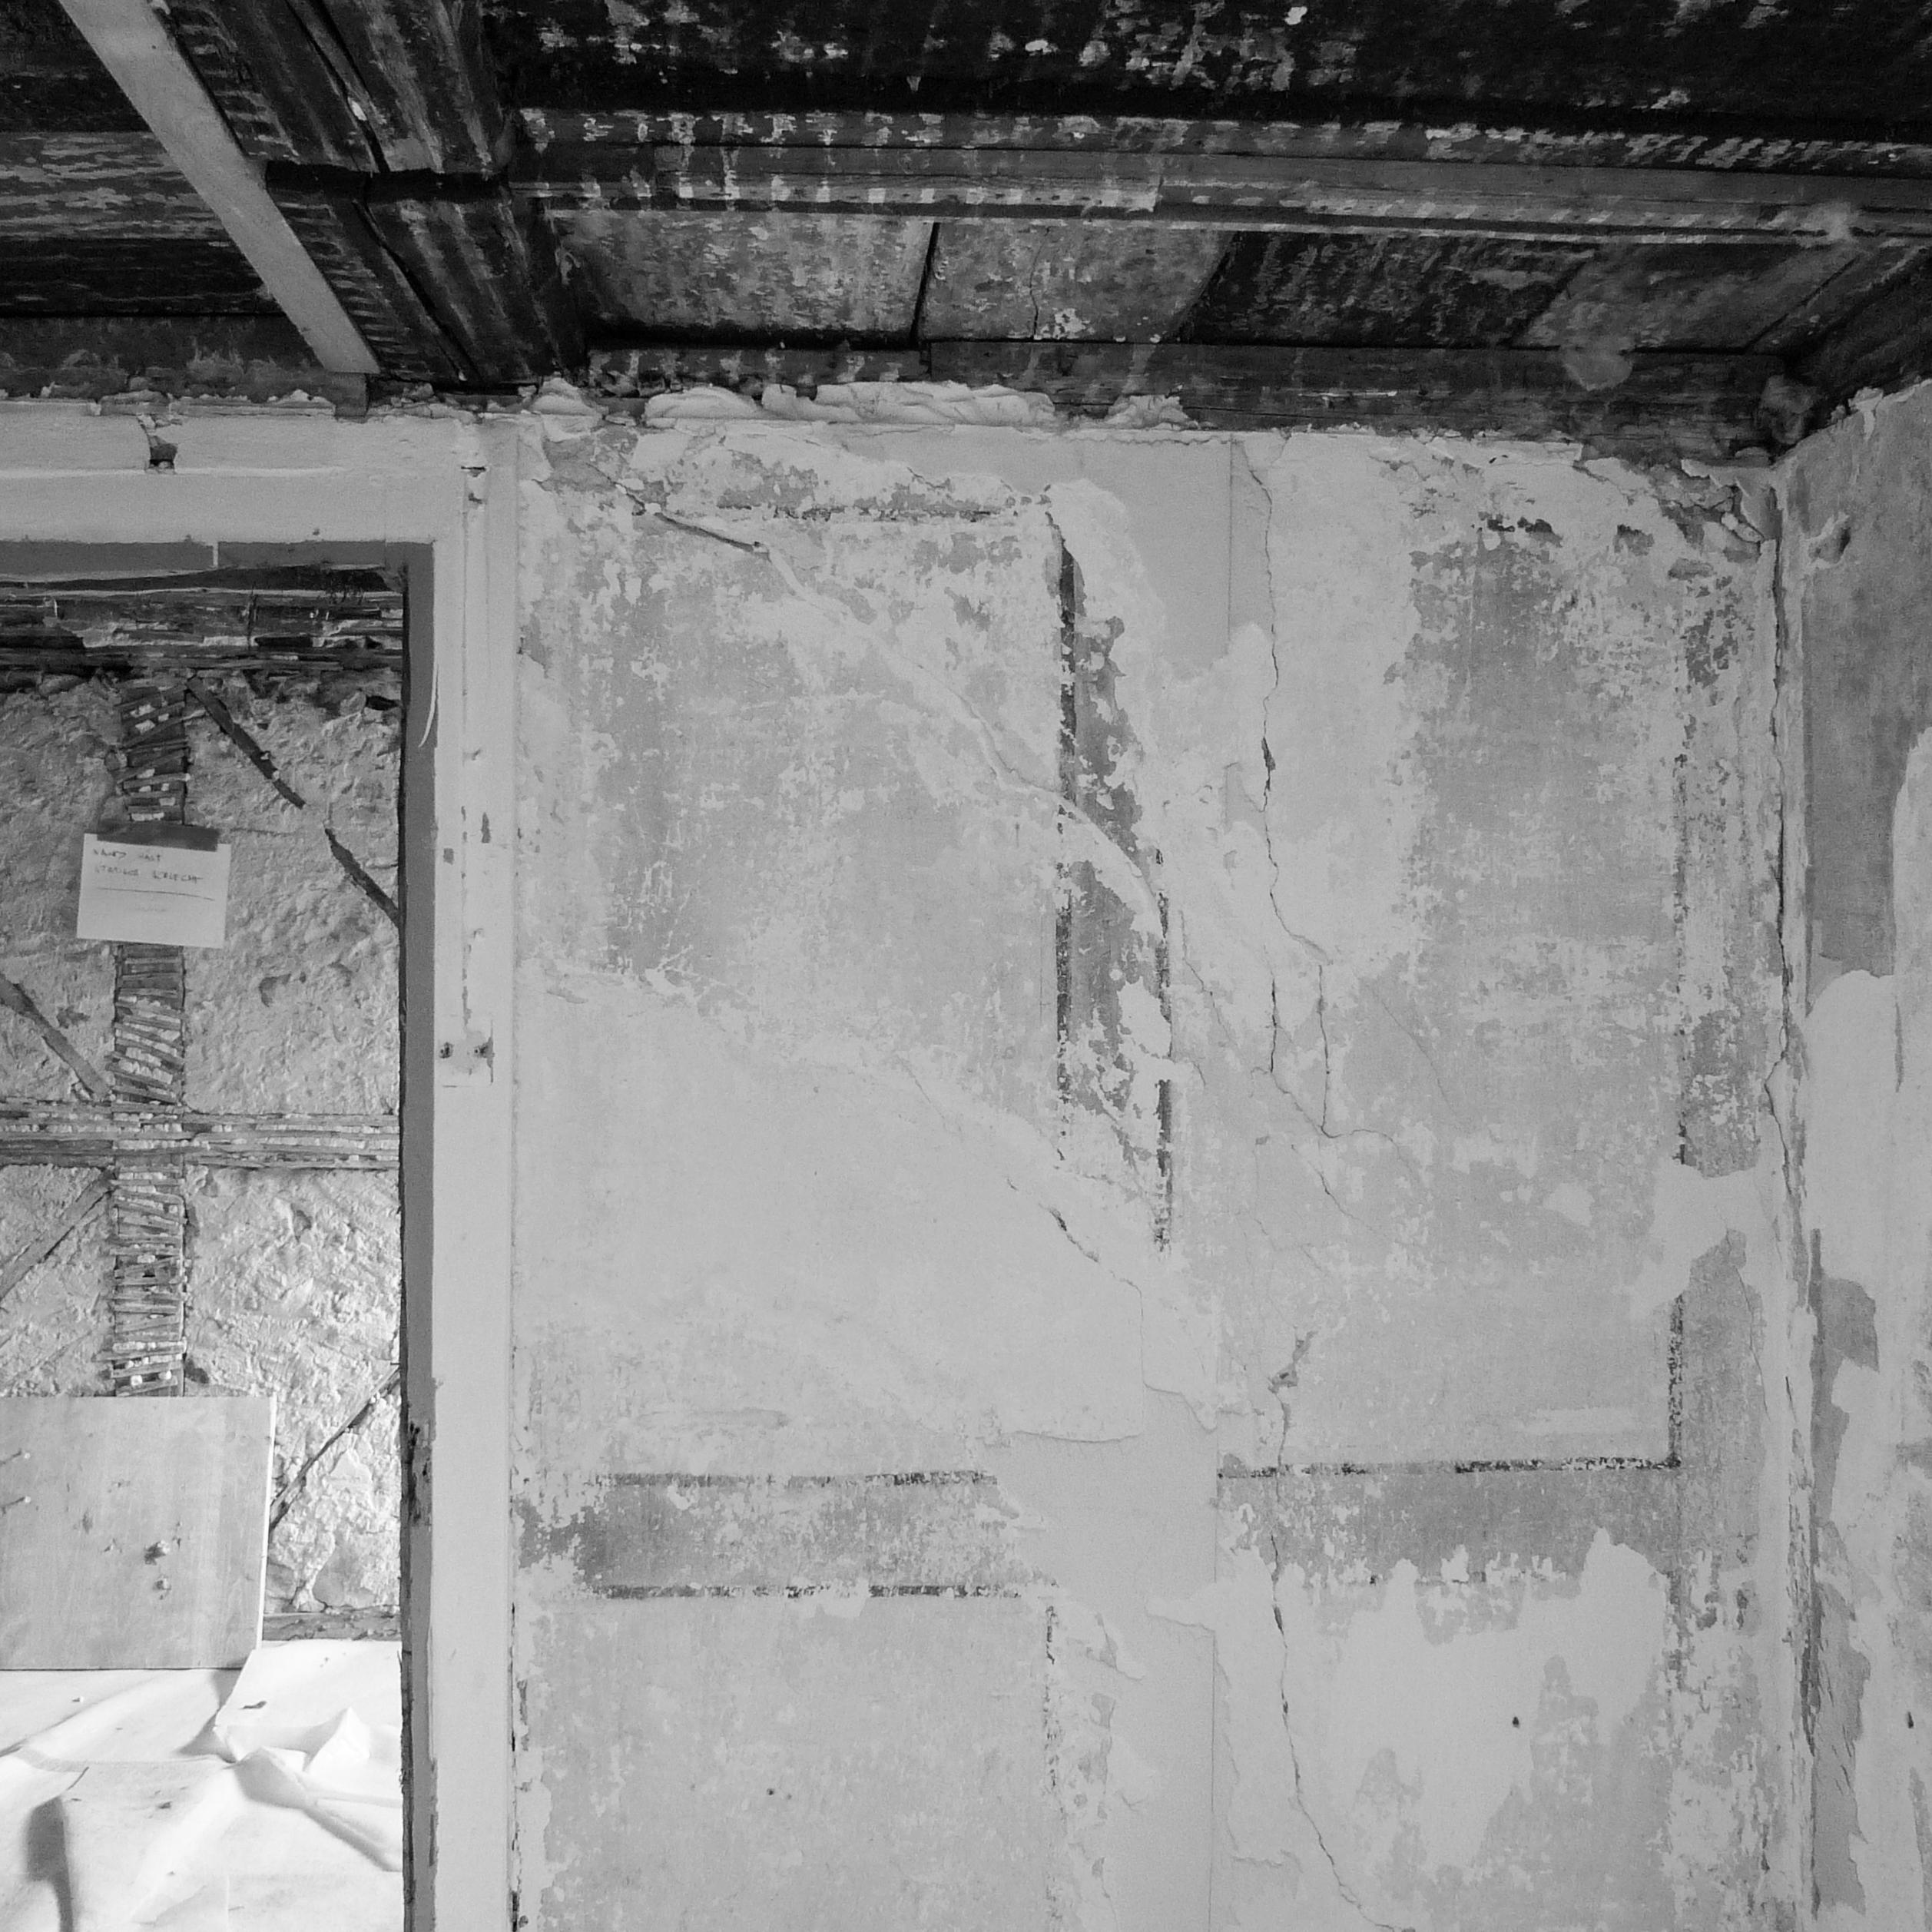 ROMAN HUTTER ARCHITEKTUR | LUZERN | RHA